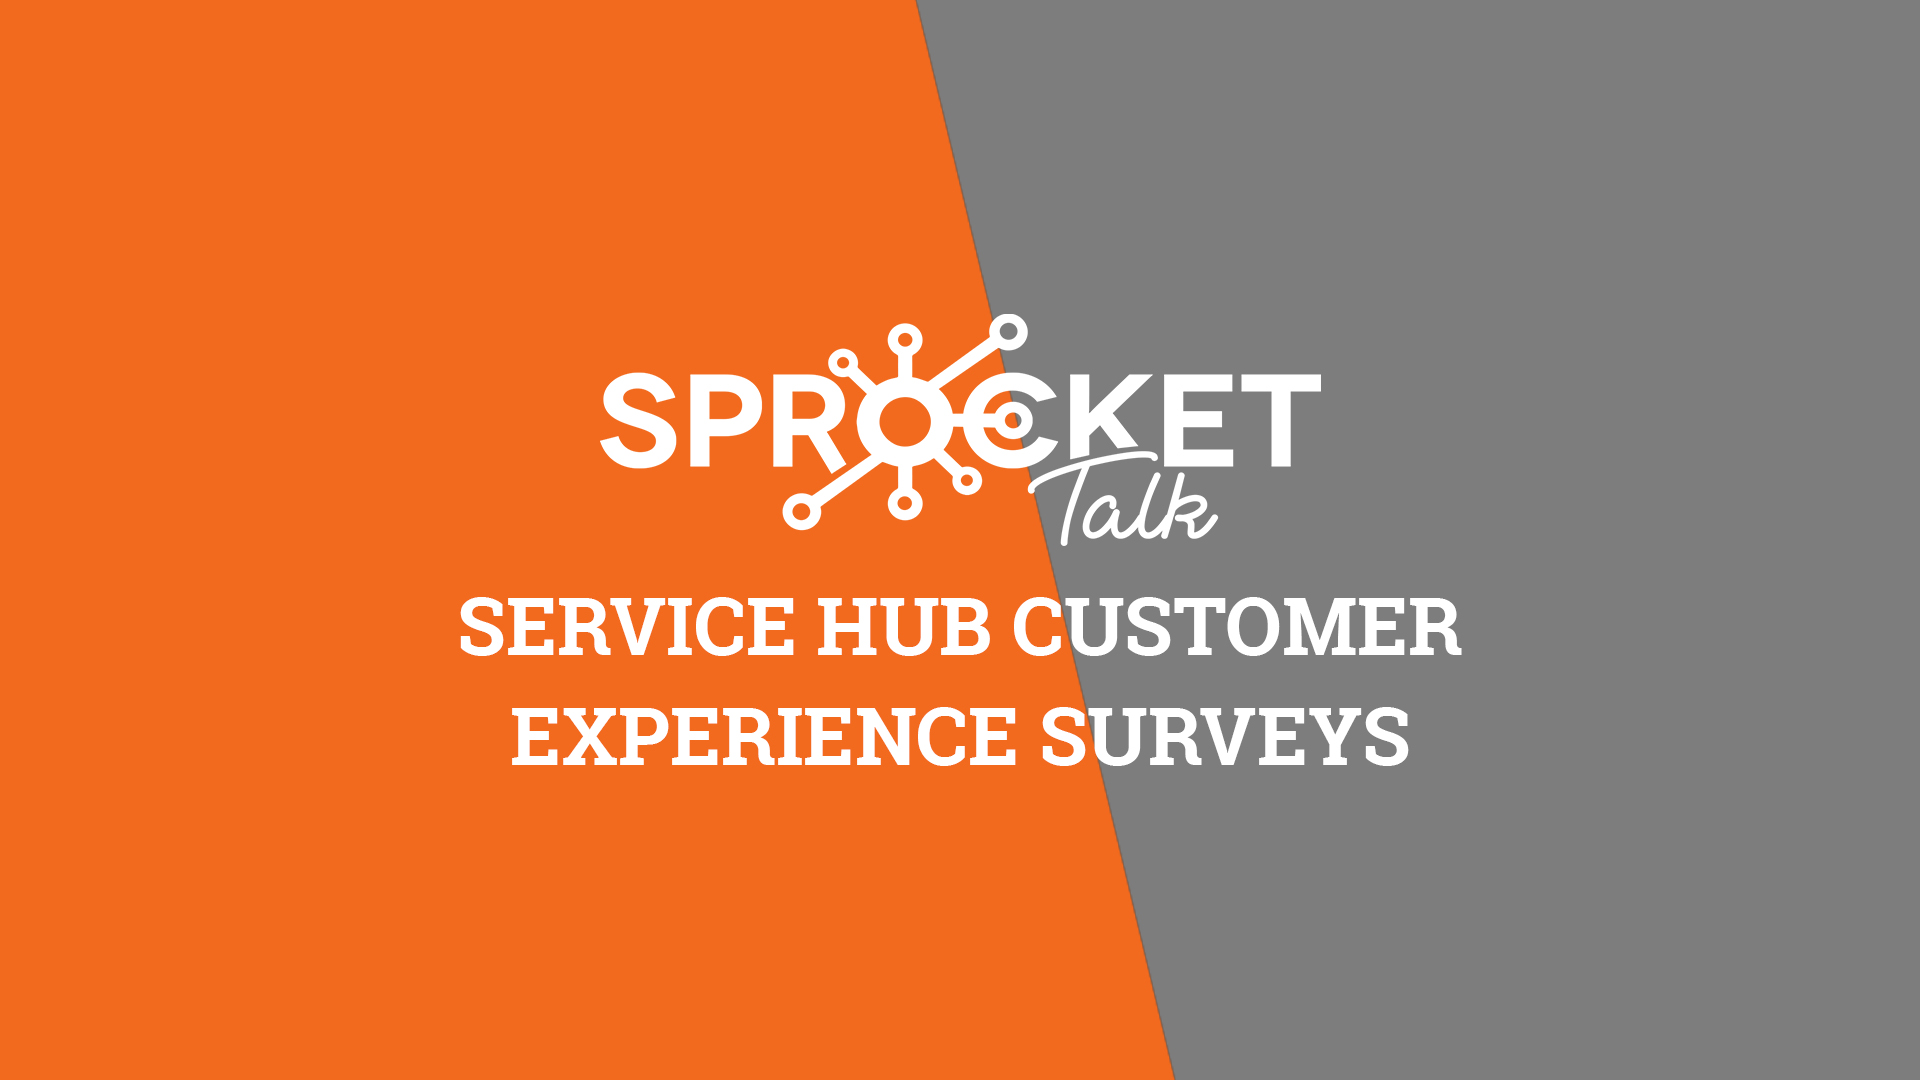 Service Hub Customer Experience Surveys